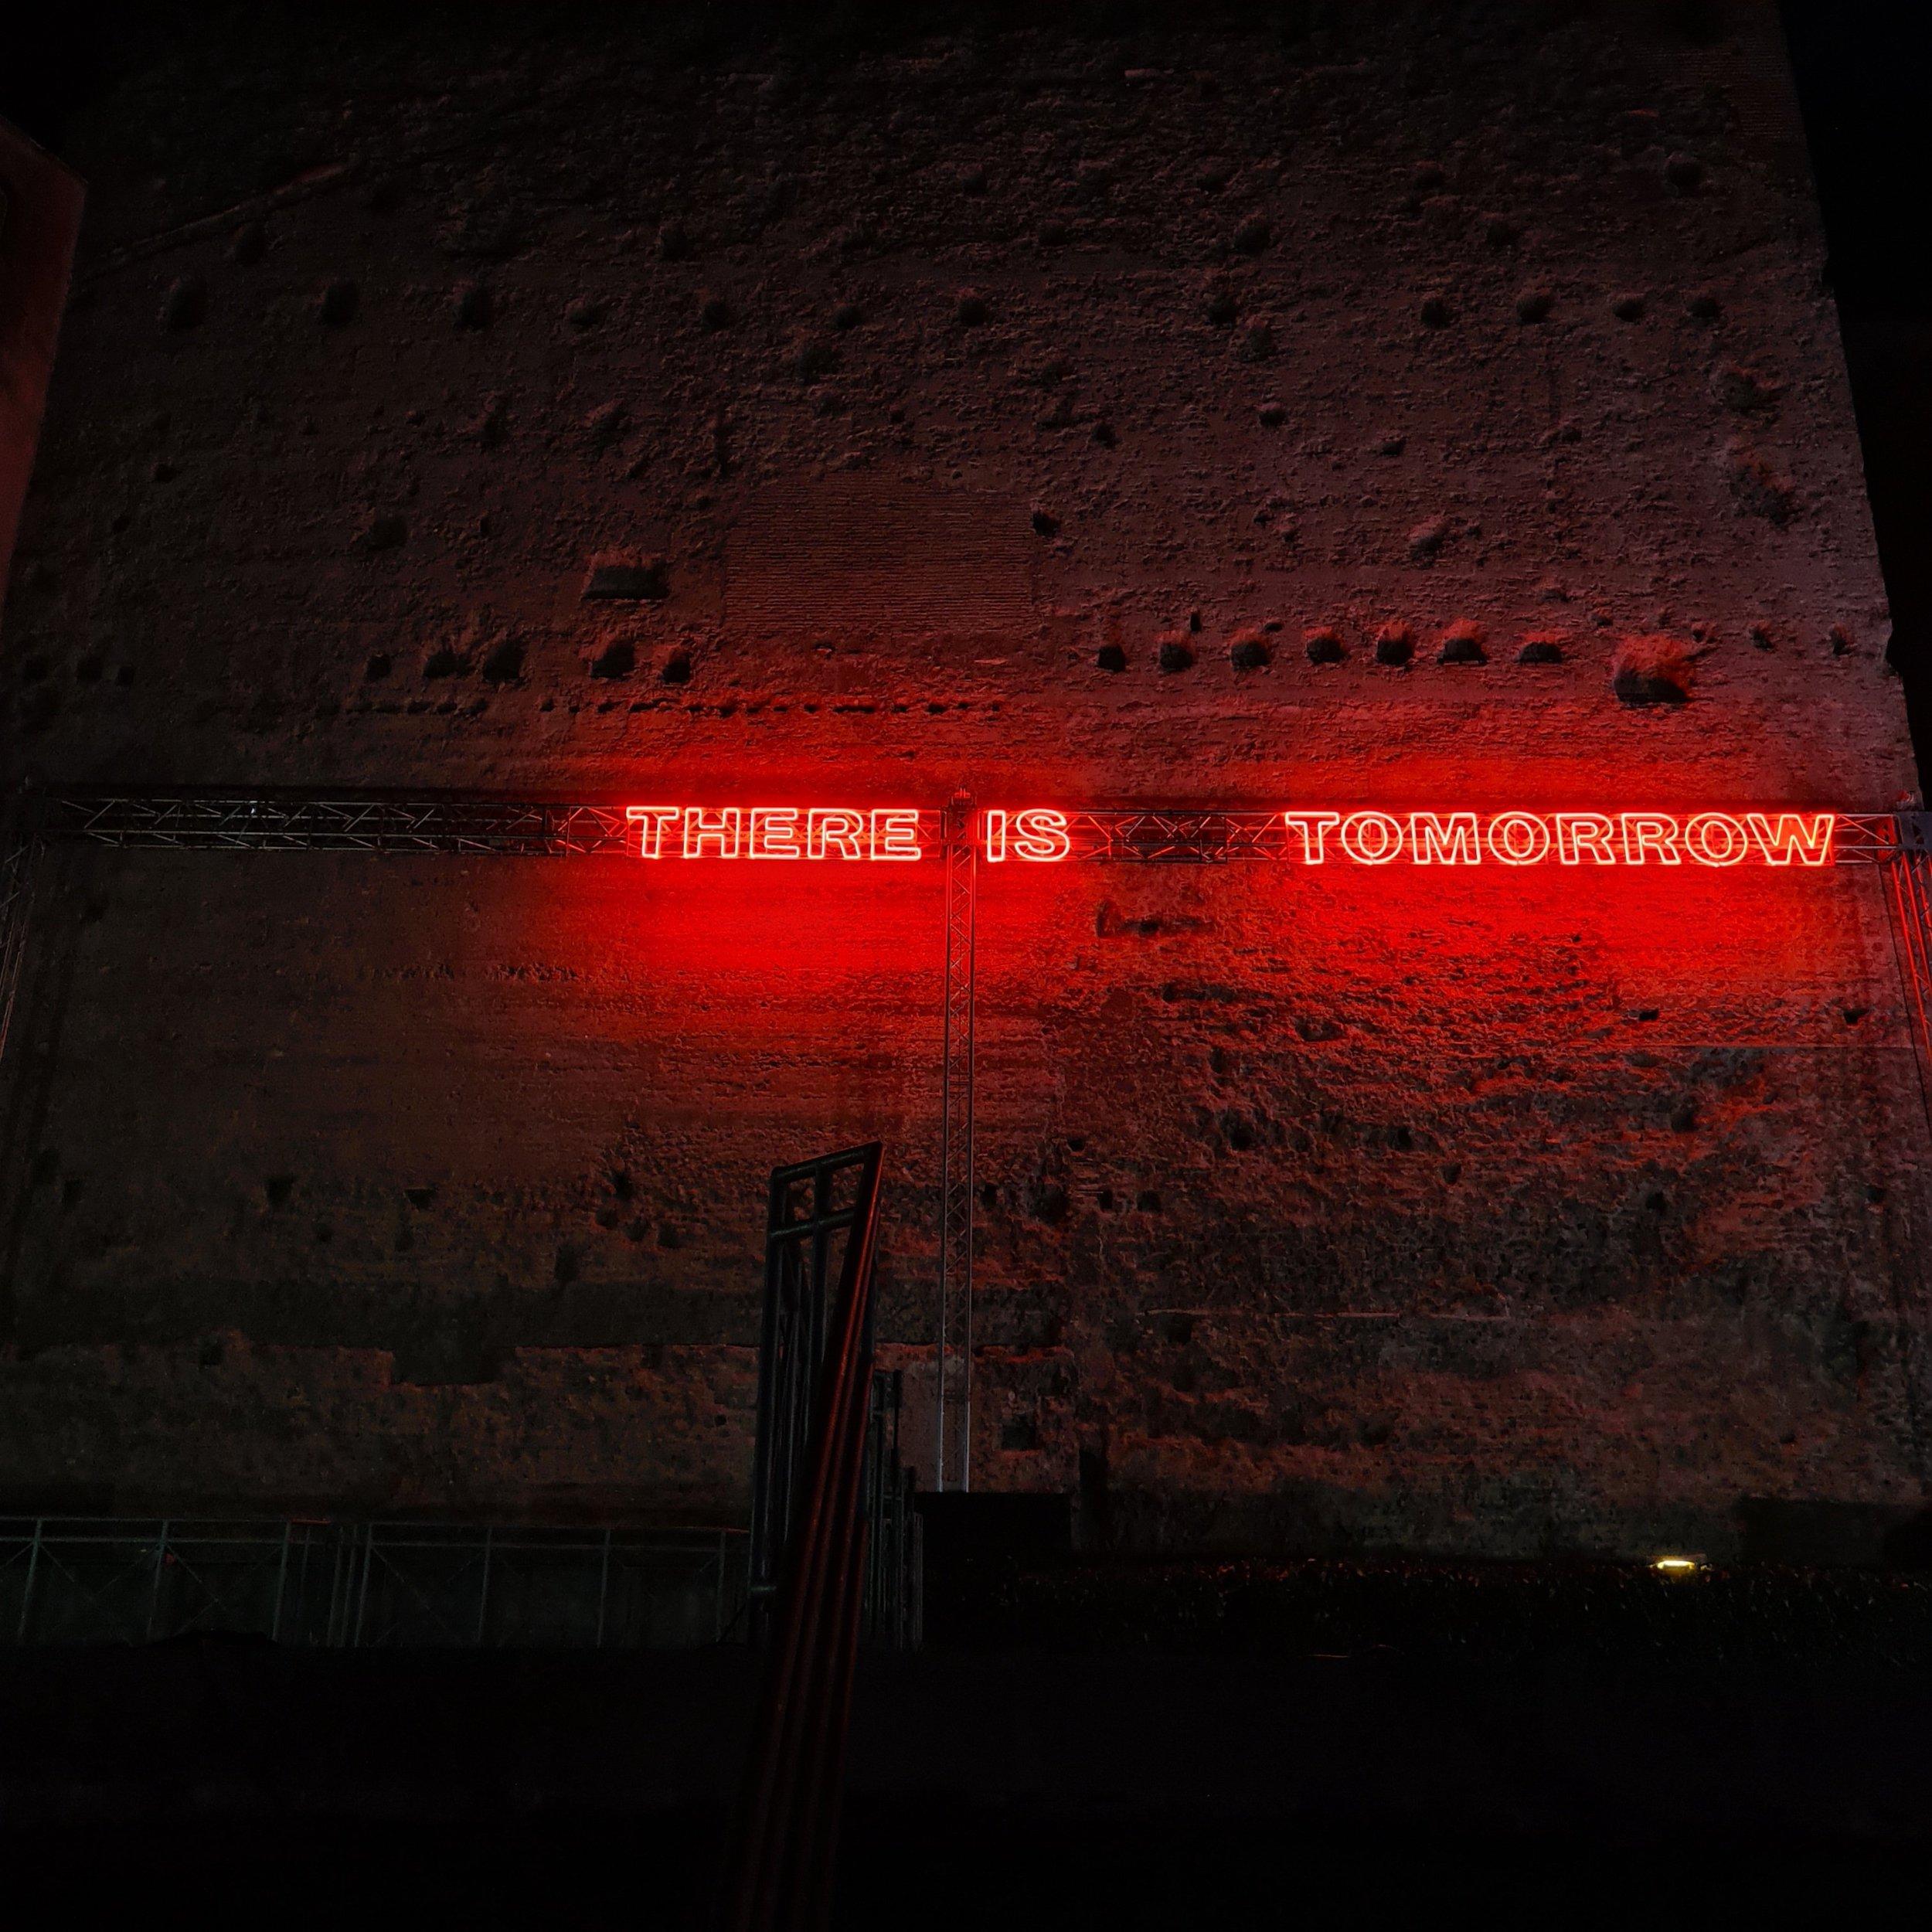 Tim Etchells, Live Like, 2020. Neon. 55 x 1583 cm. Photographer: Luca Pintacuda.